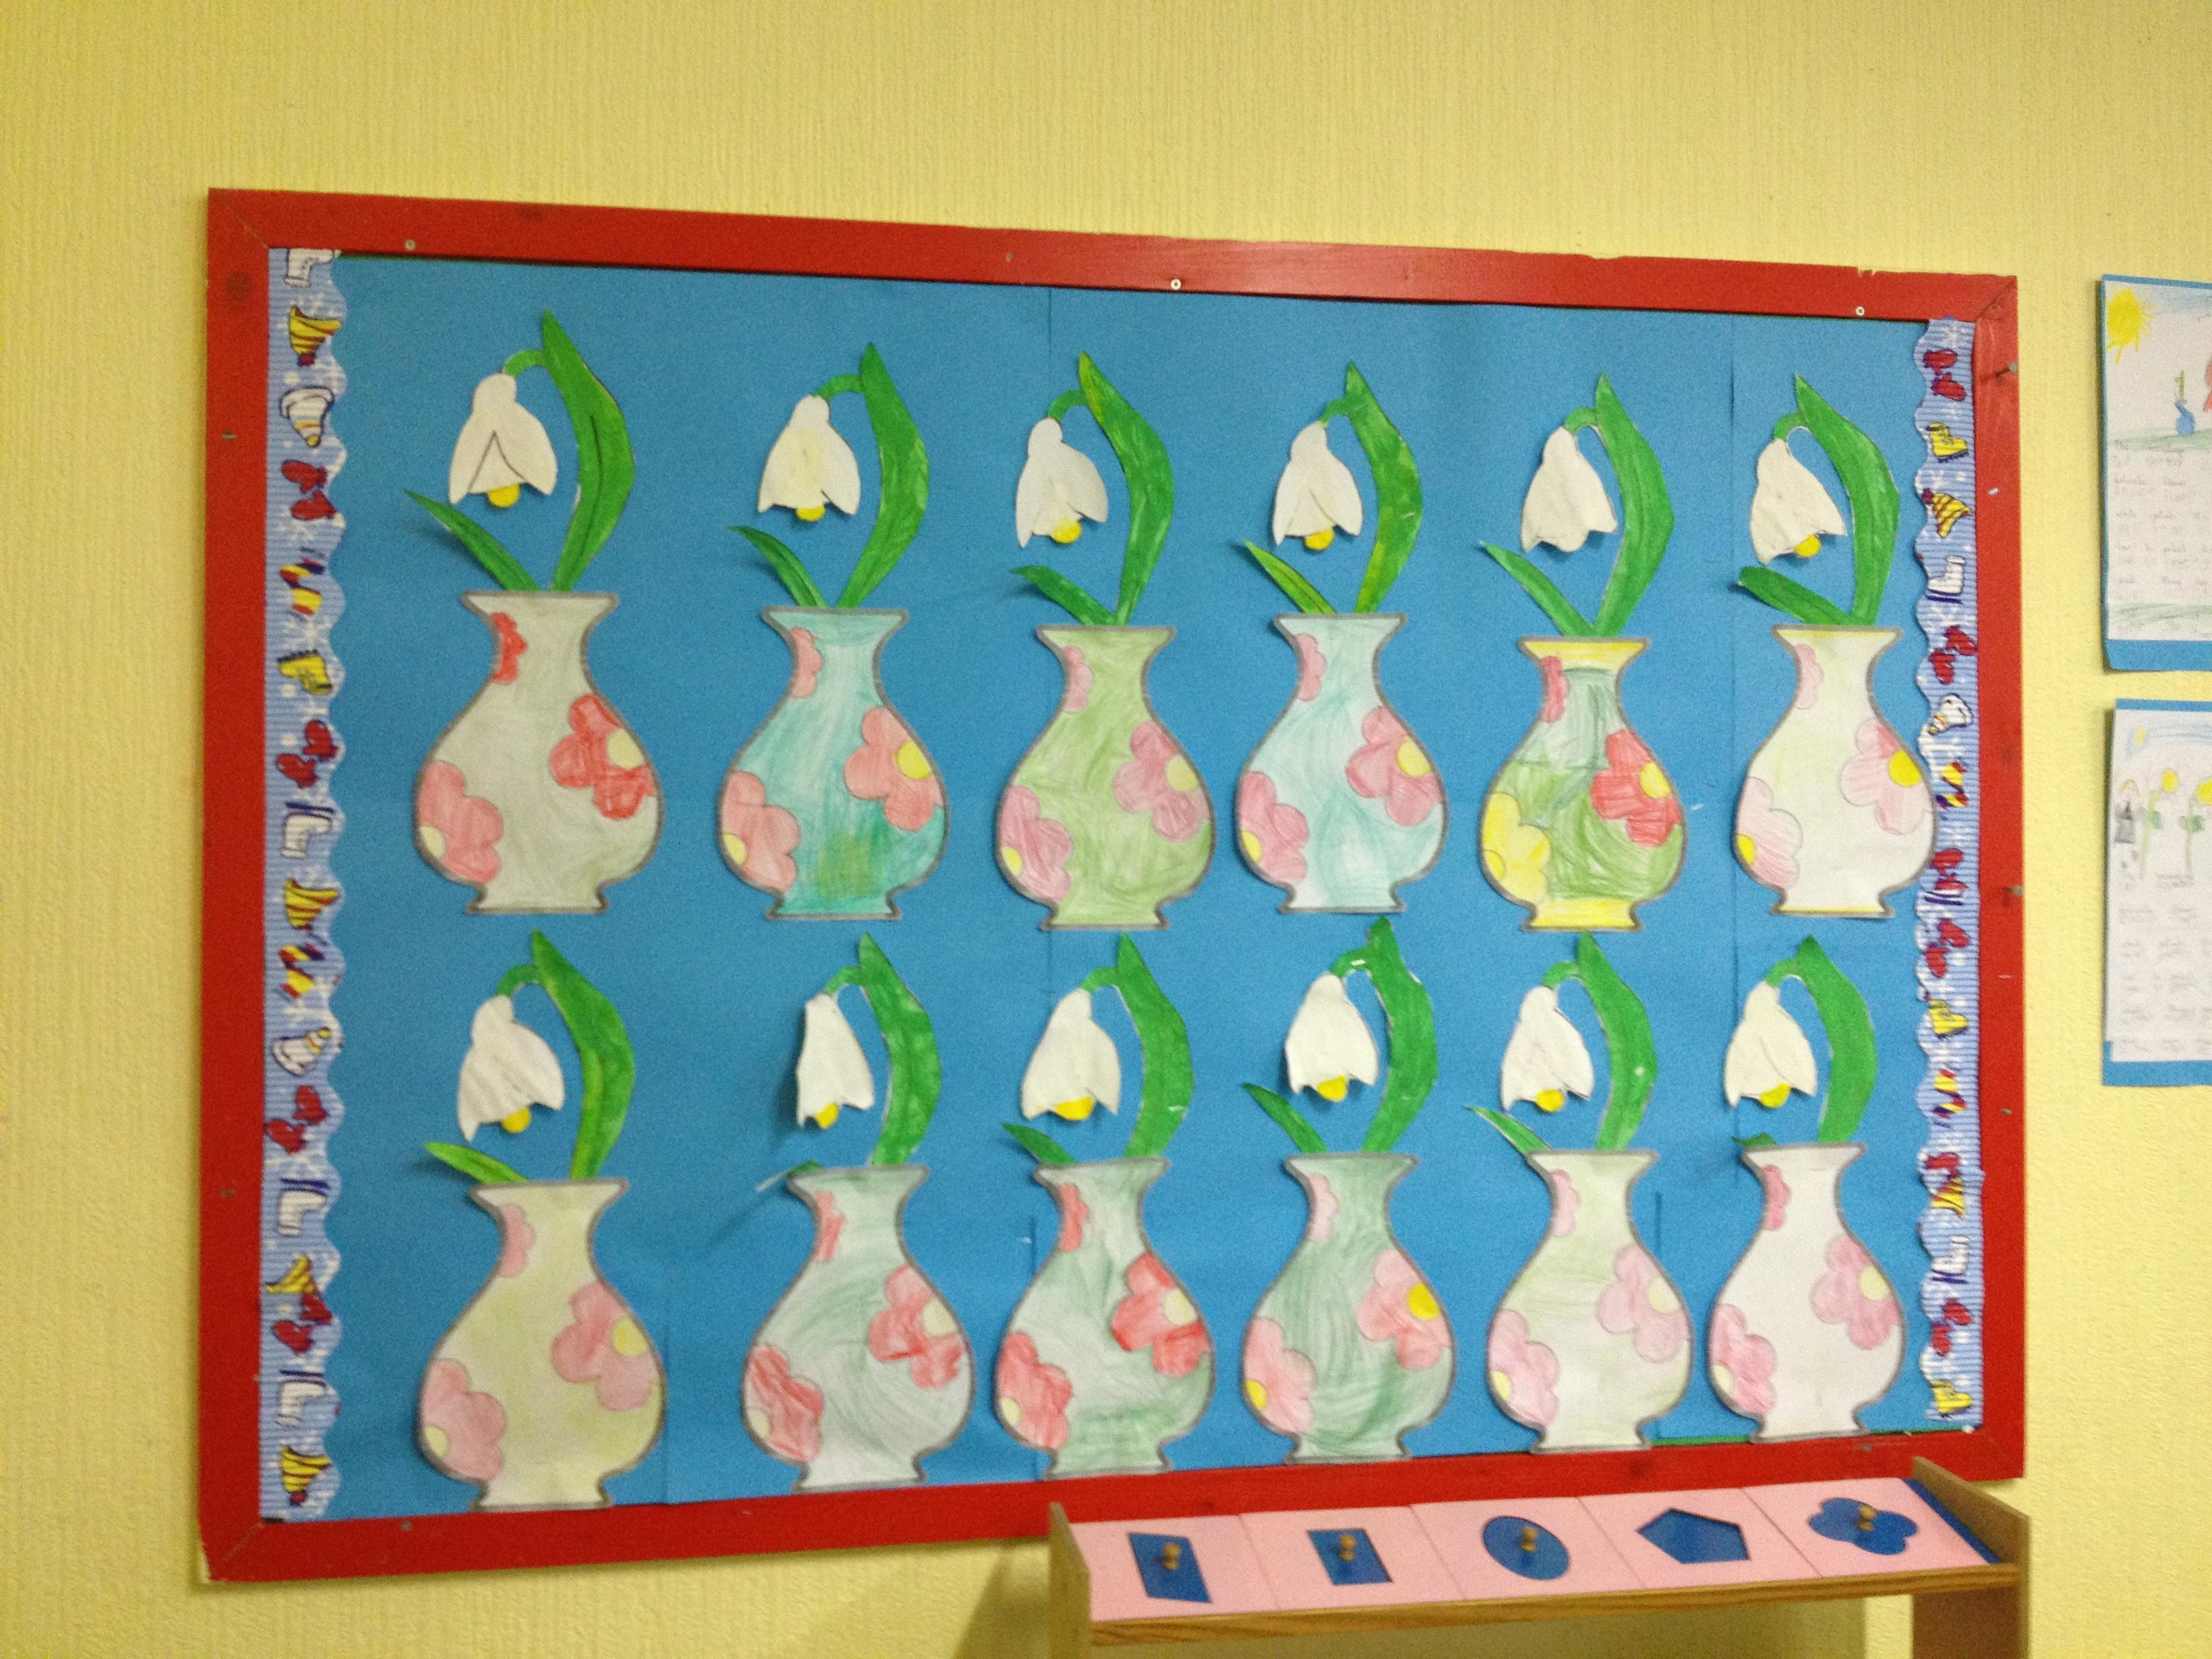 Montessori Classroom Wall Decoration ~ Montessori classroom decoration imgkid the